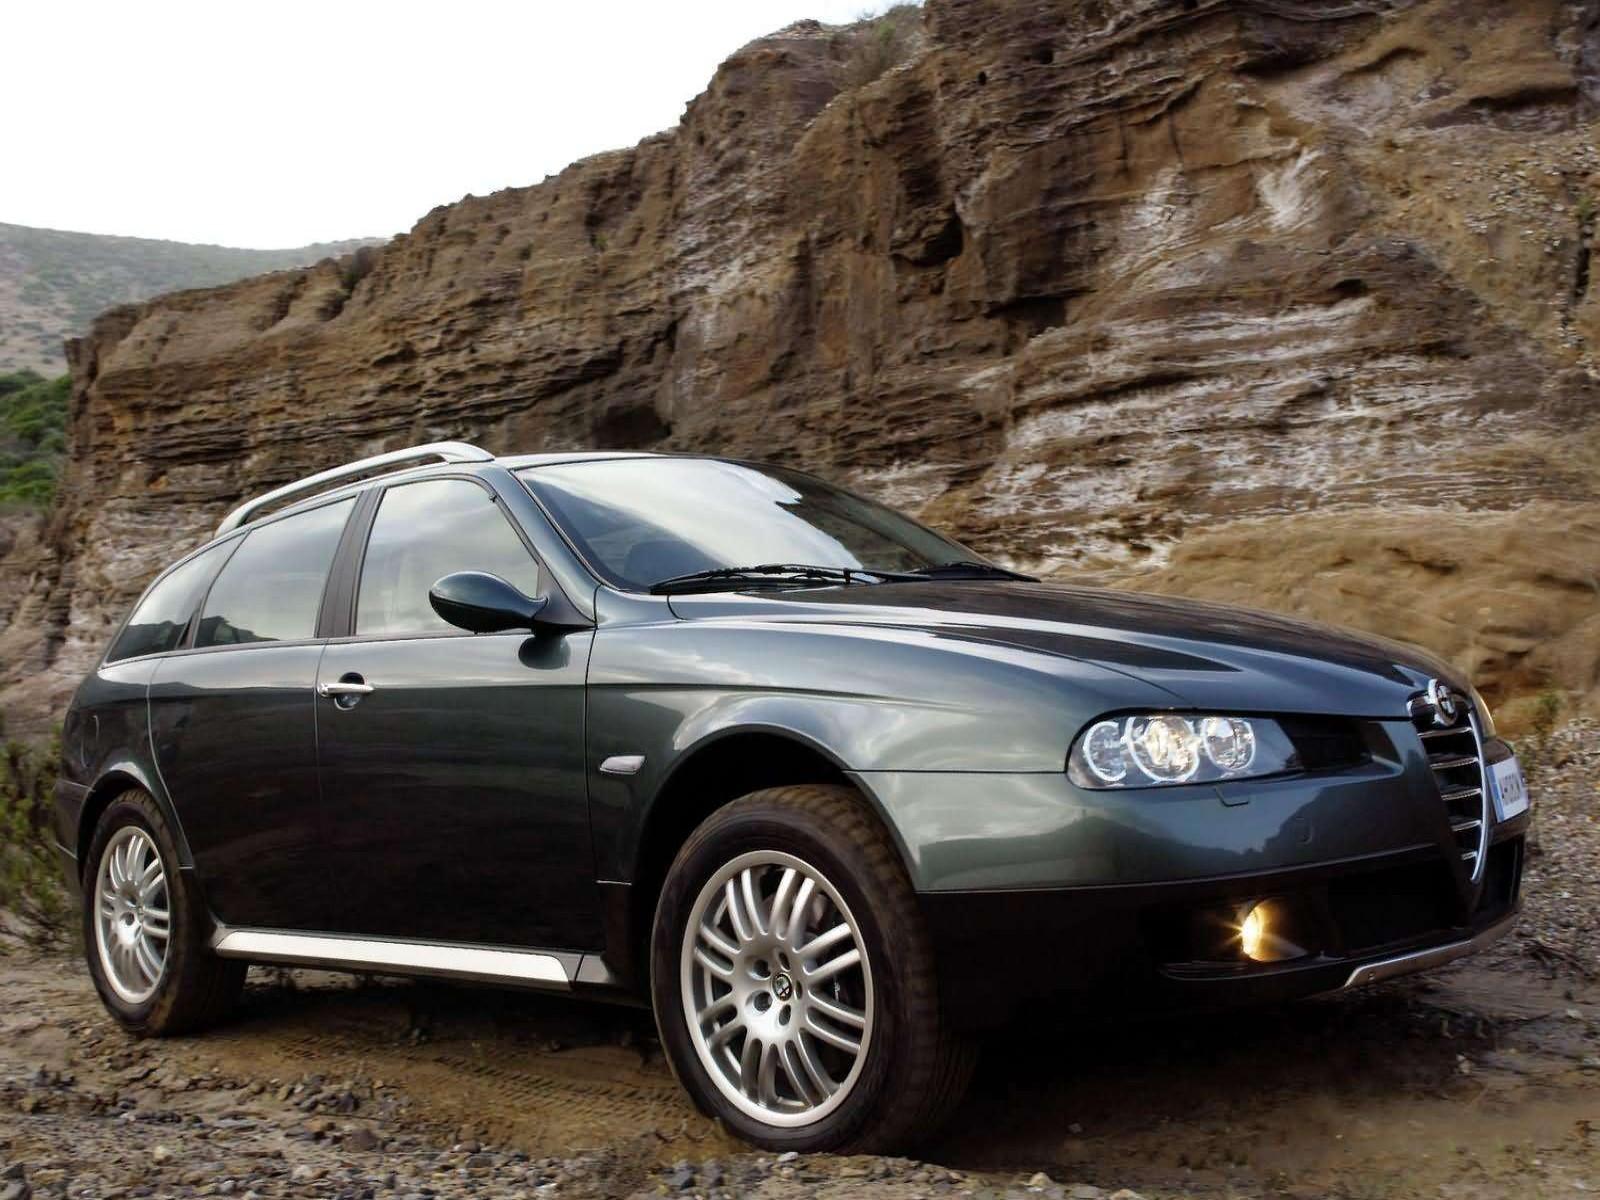 car pictures alfa romeo 156 crosswagon q4 2004. Black Bedroom Furniture Sets. Home Design Ideas